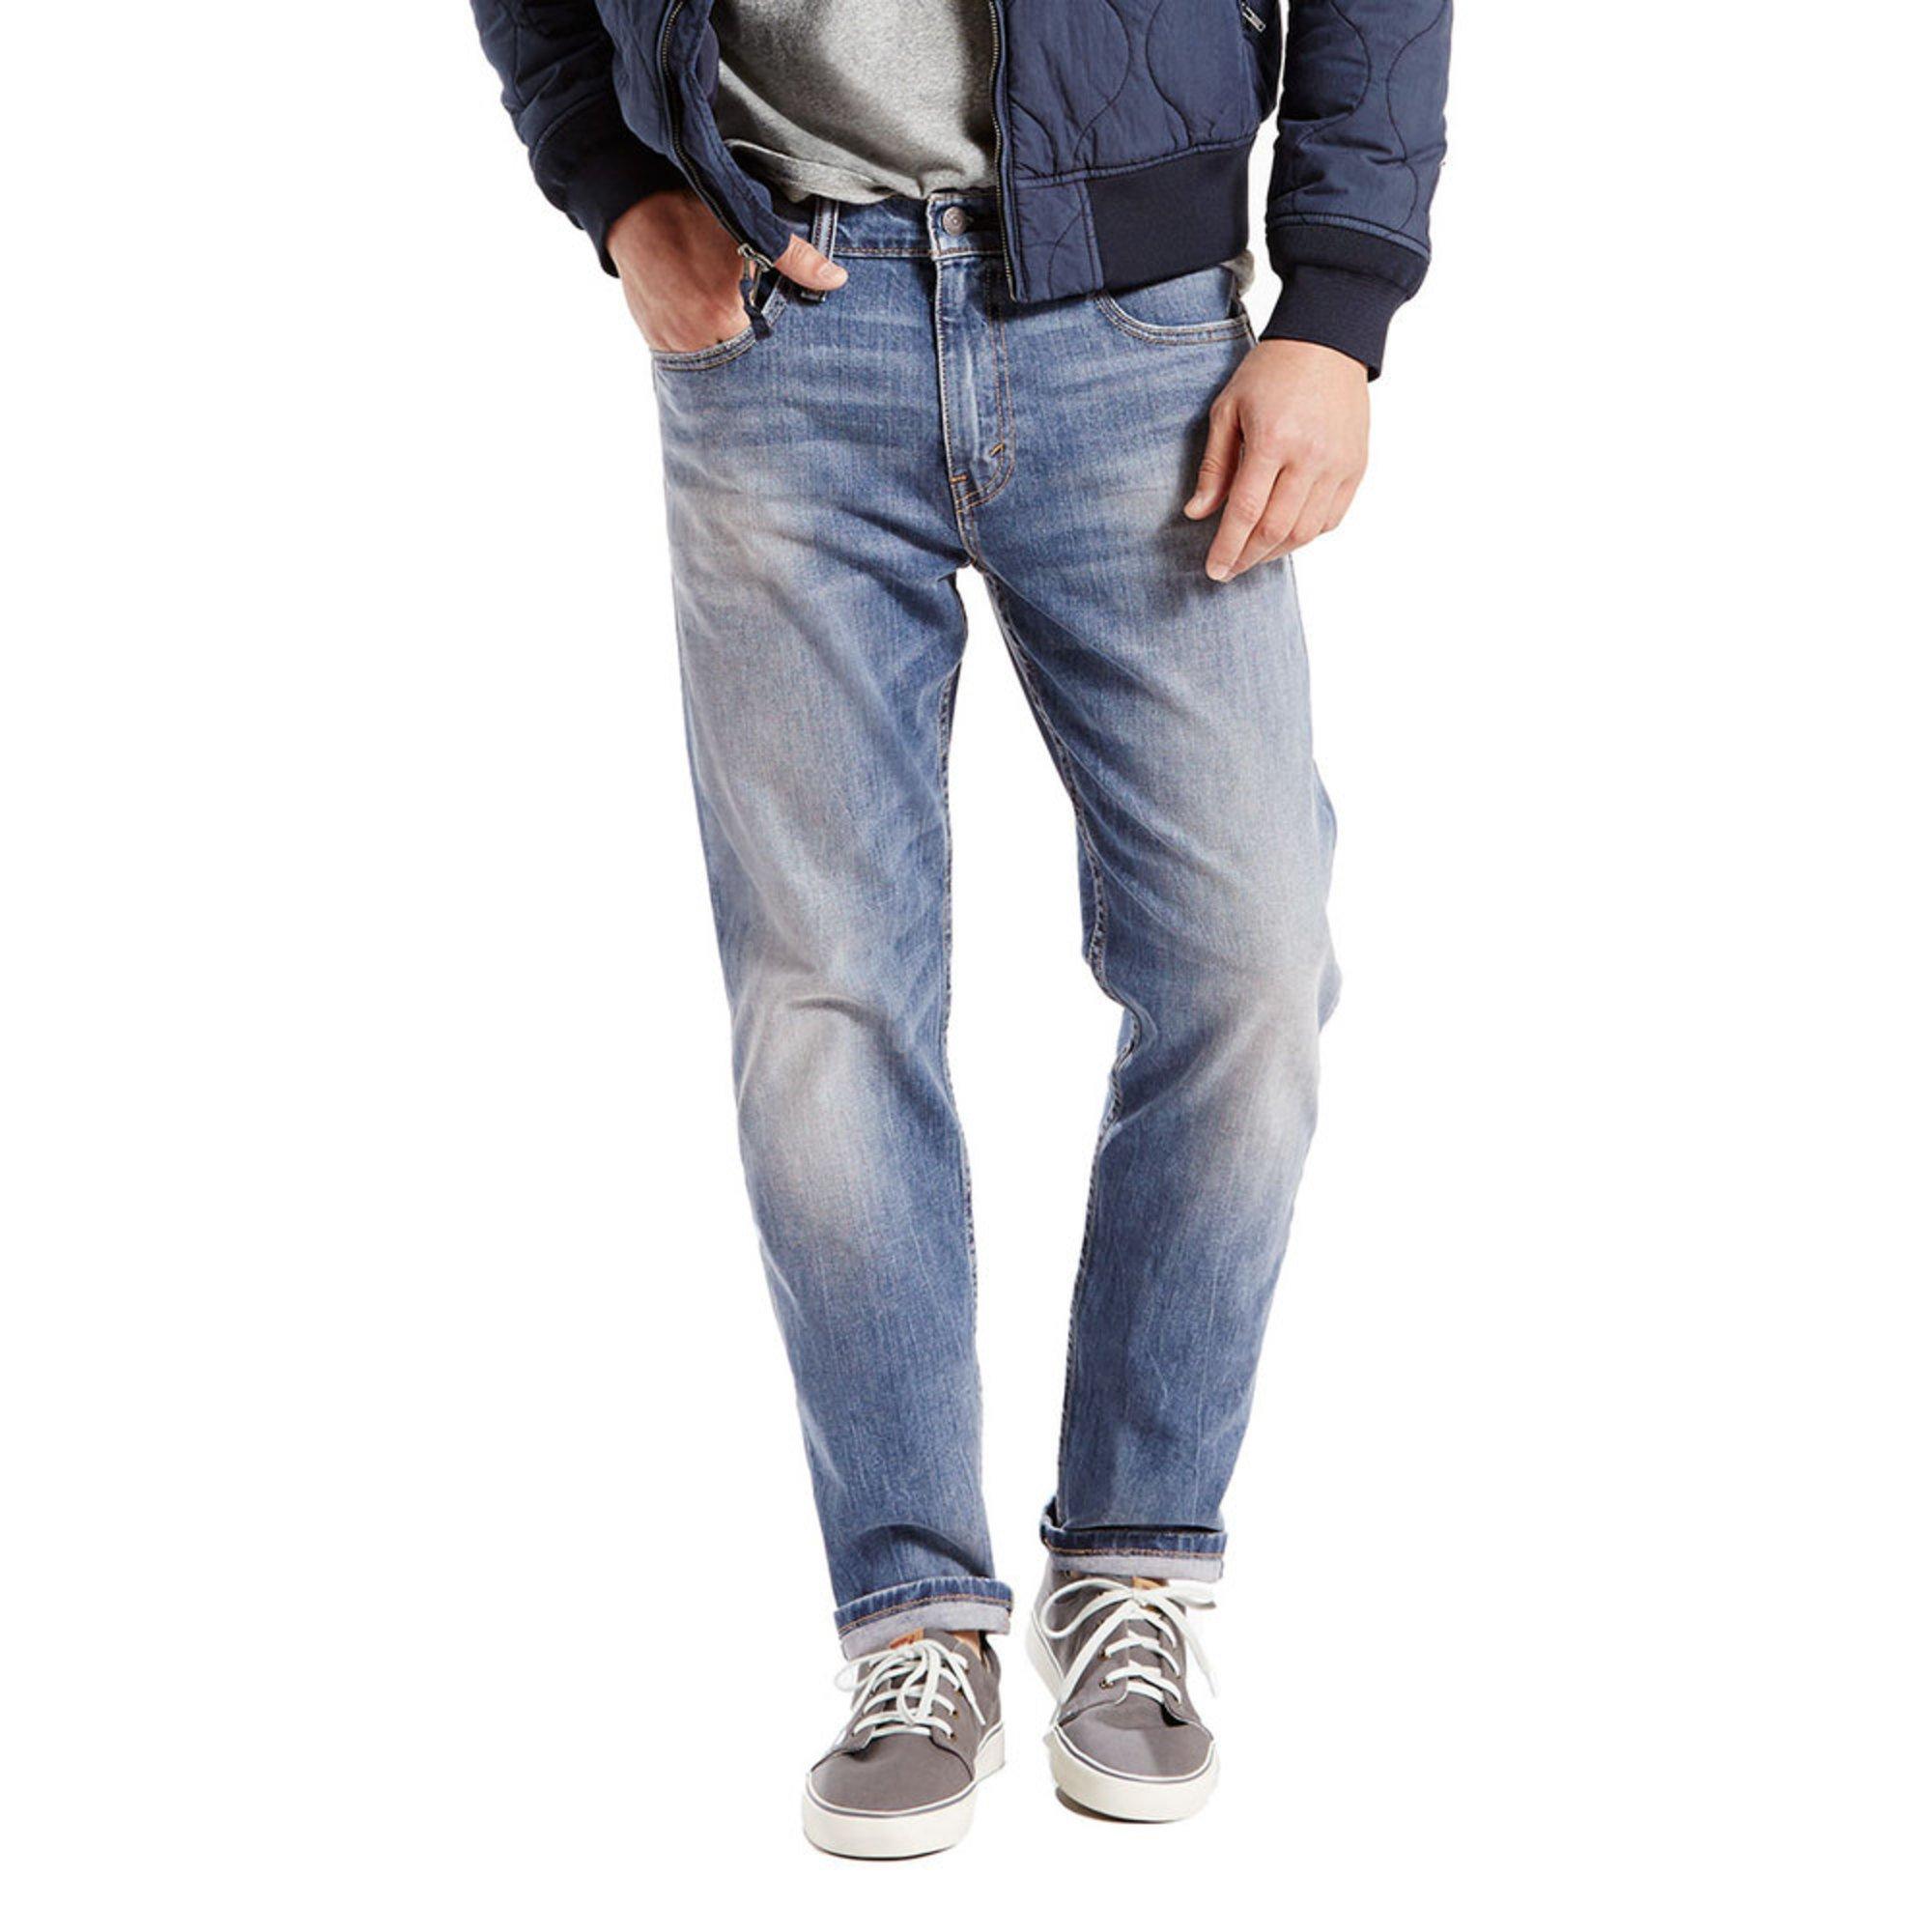 871a43f4269 Levi s. Levi s Men s 502 Regular Taper Denim Jeans